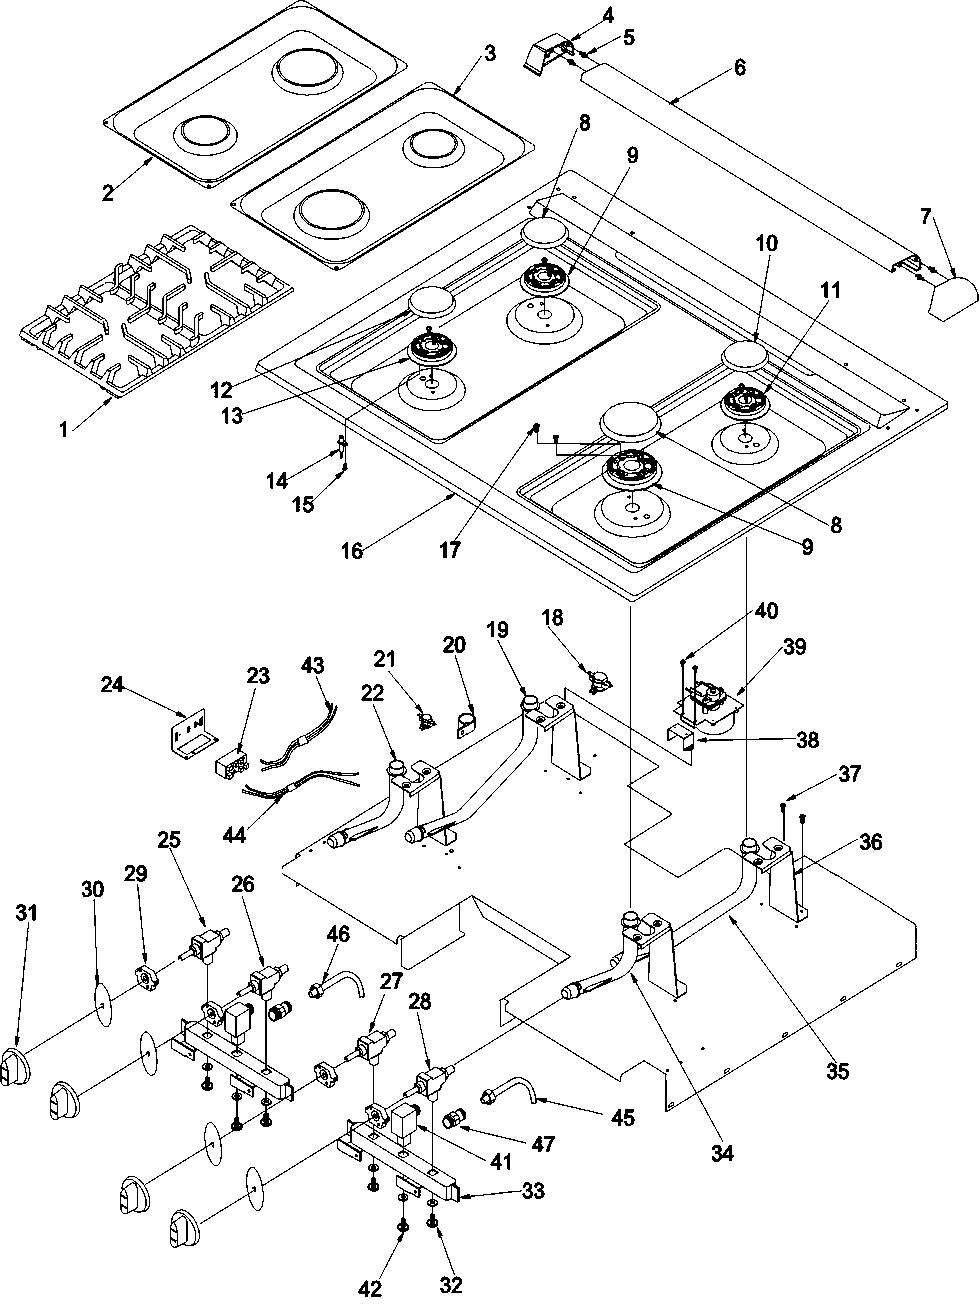 hight resolution of args7650ll gas range main top parts diagram